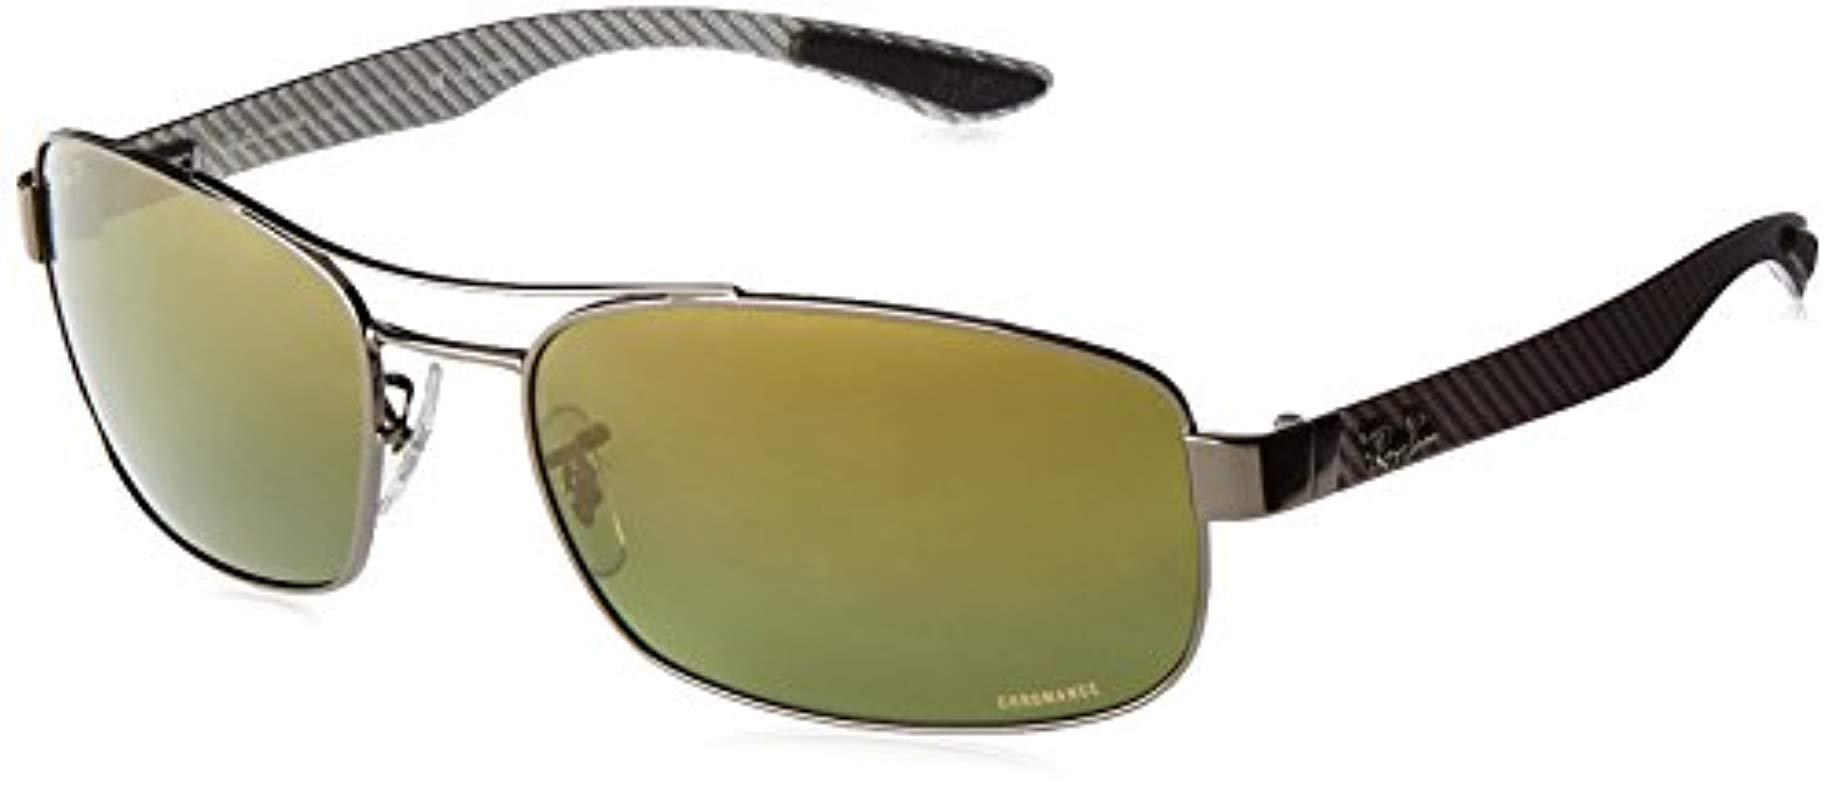 b58a5574f2 Lyst - Ray-Ban Rb8318ch Chromance Lens Rectangular Metal Sunglasses ...